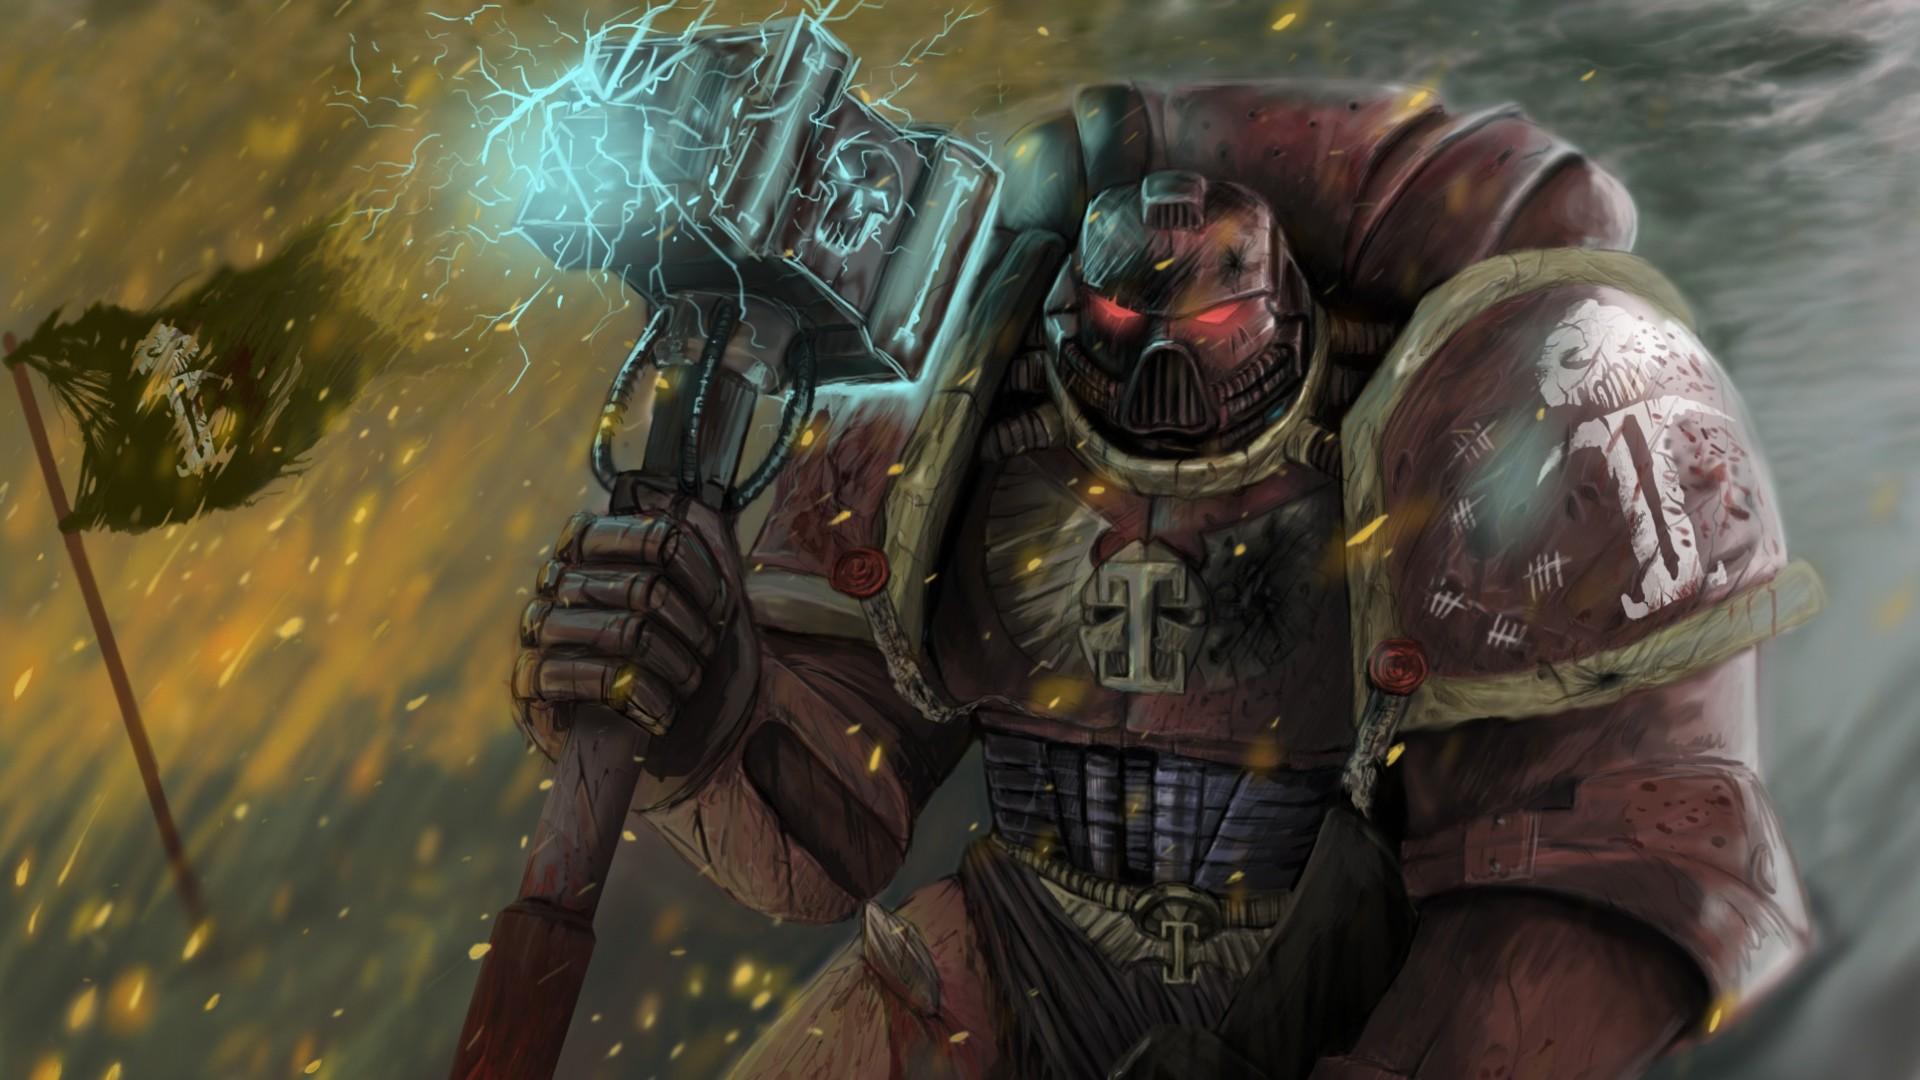 Download Wallpaper Warhammer 40k, Space marine, Game, Space .